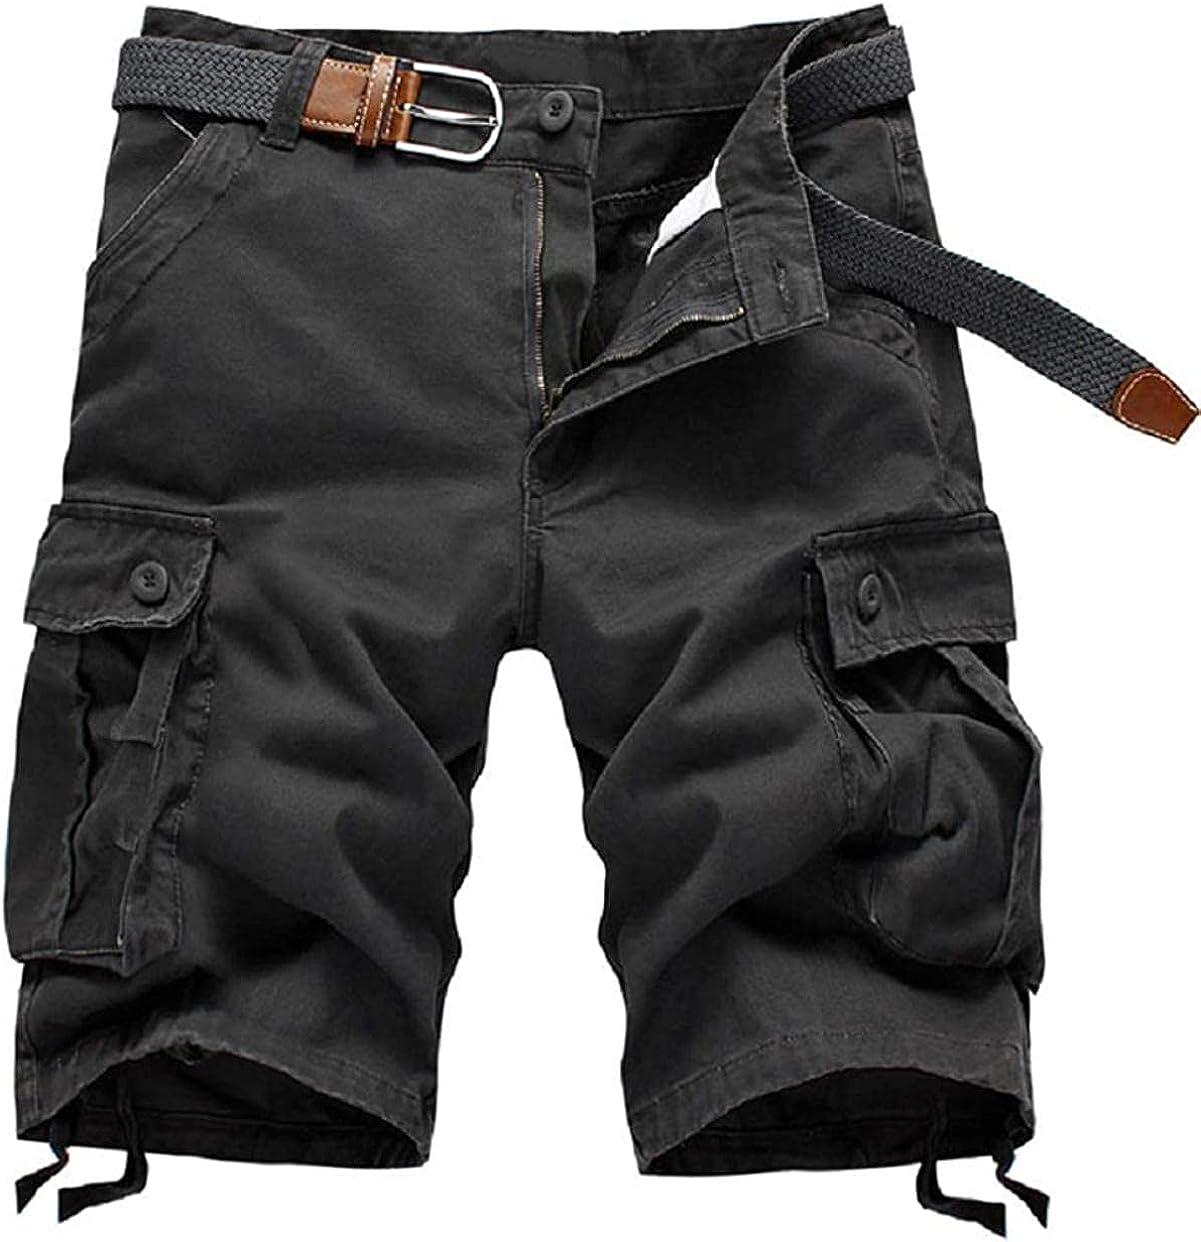 Rsqsjgkert Men's Summer Active Multi-Pocket Wide Leg Outdoor Bermuda Cargo Shorts